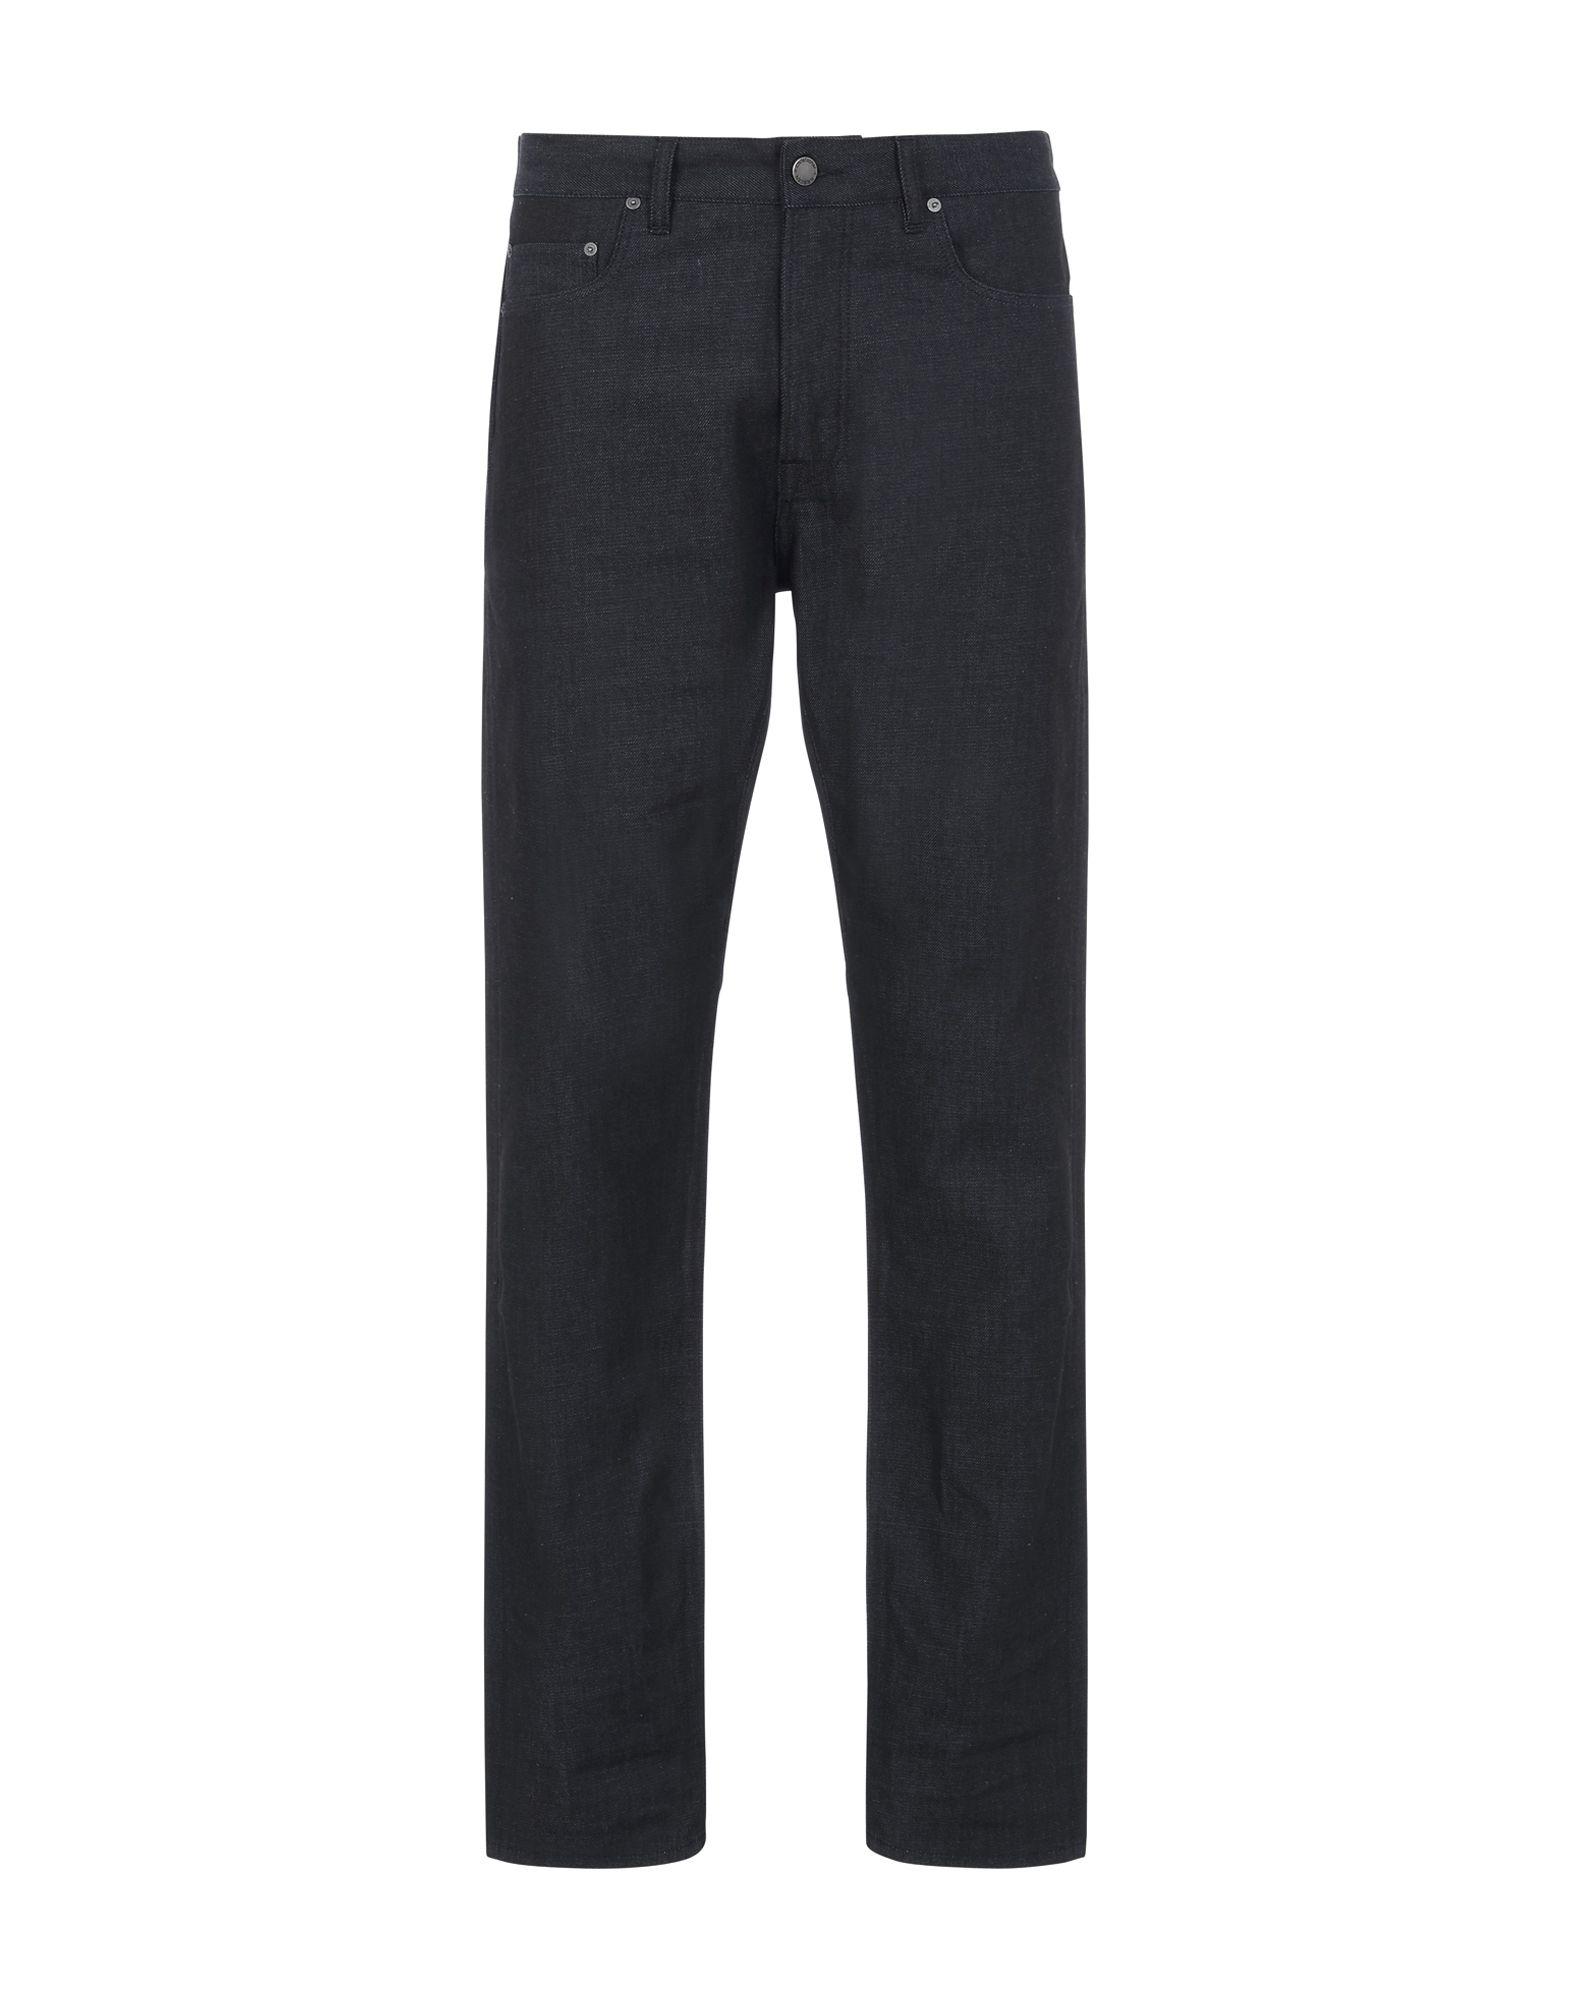 Pantaloni Jeans Christopher Raeburn Uomo - Acquista online su